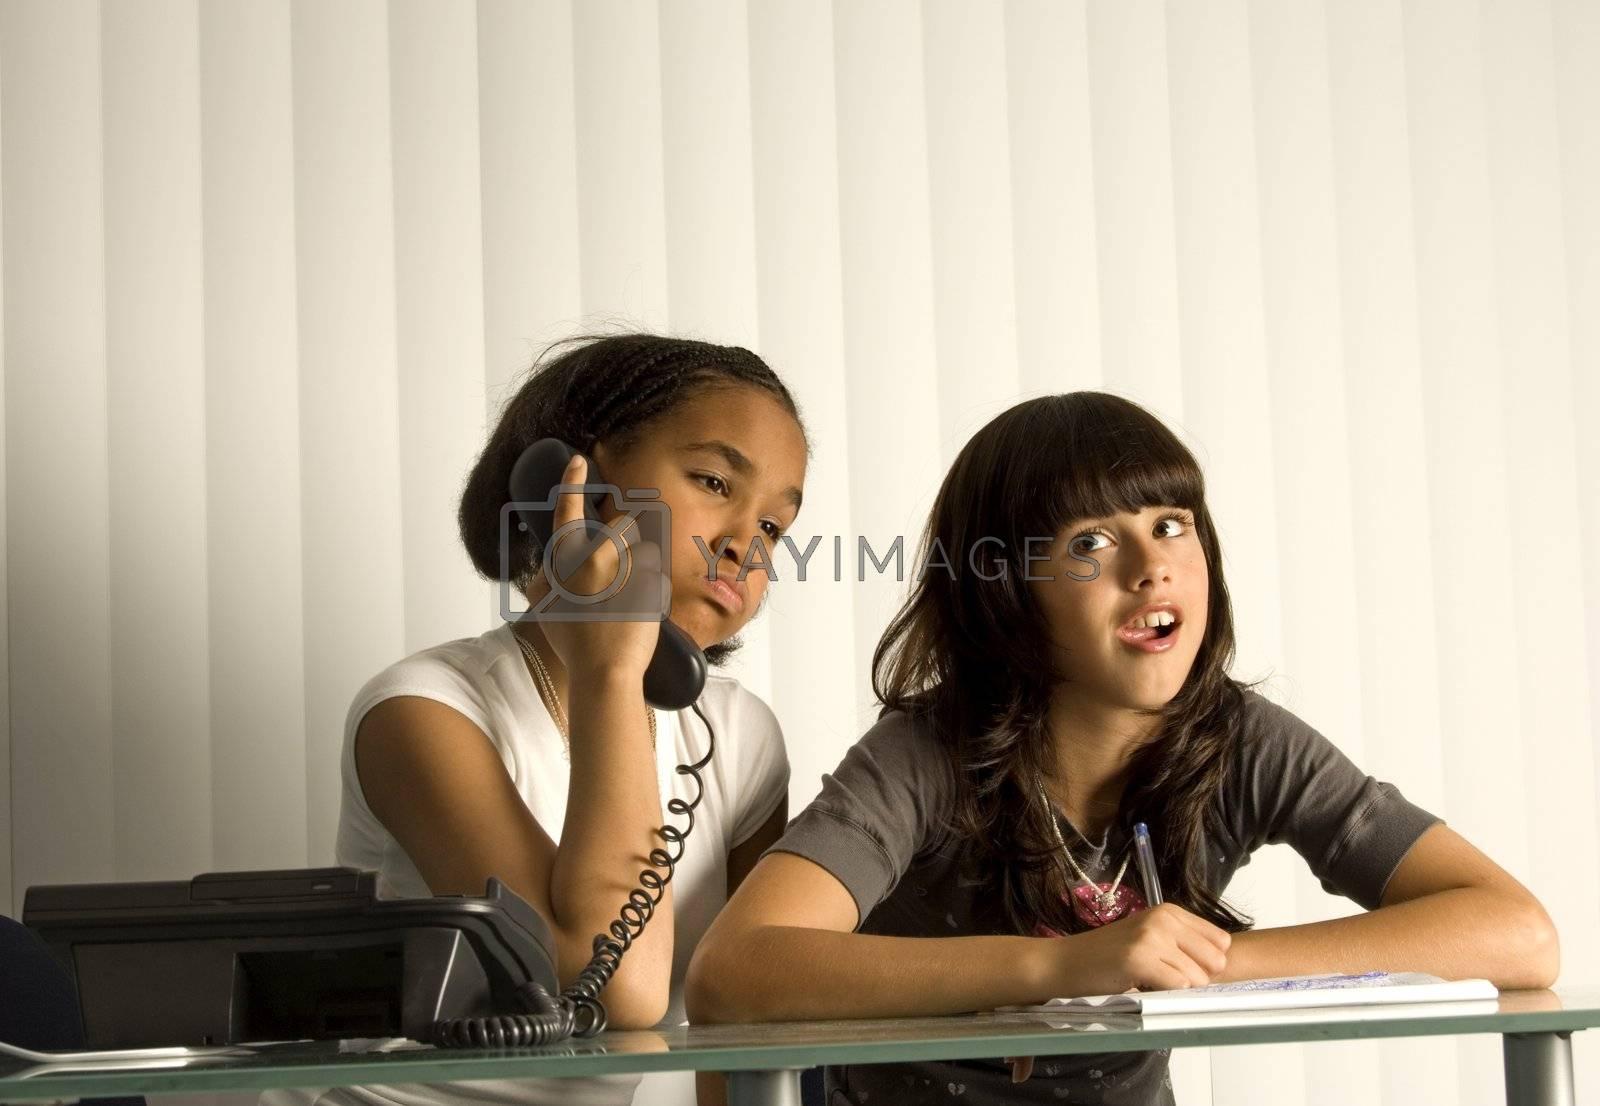 Teen Friends by hixson